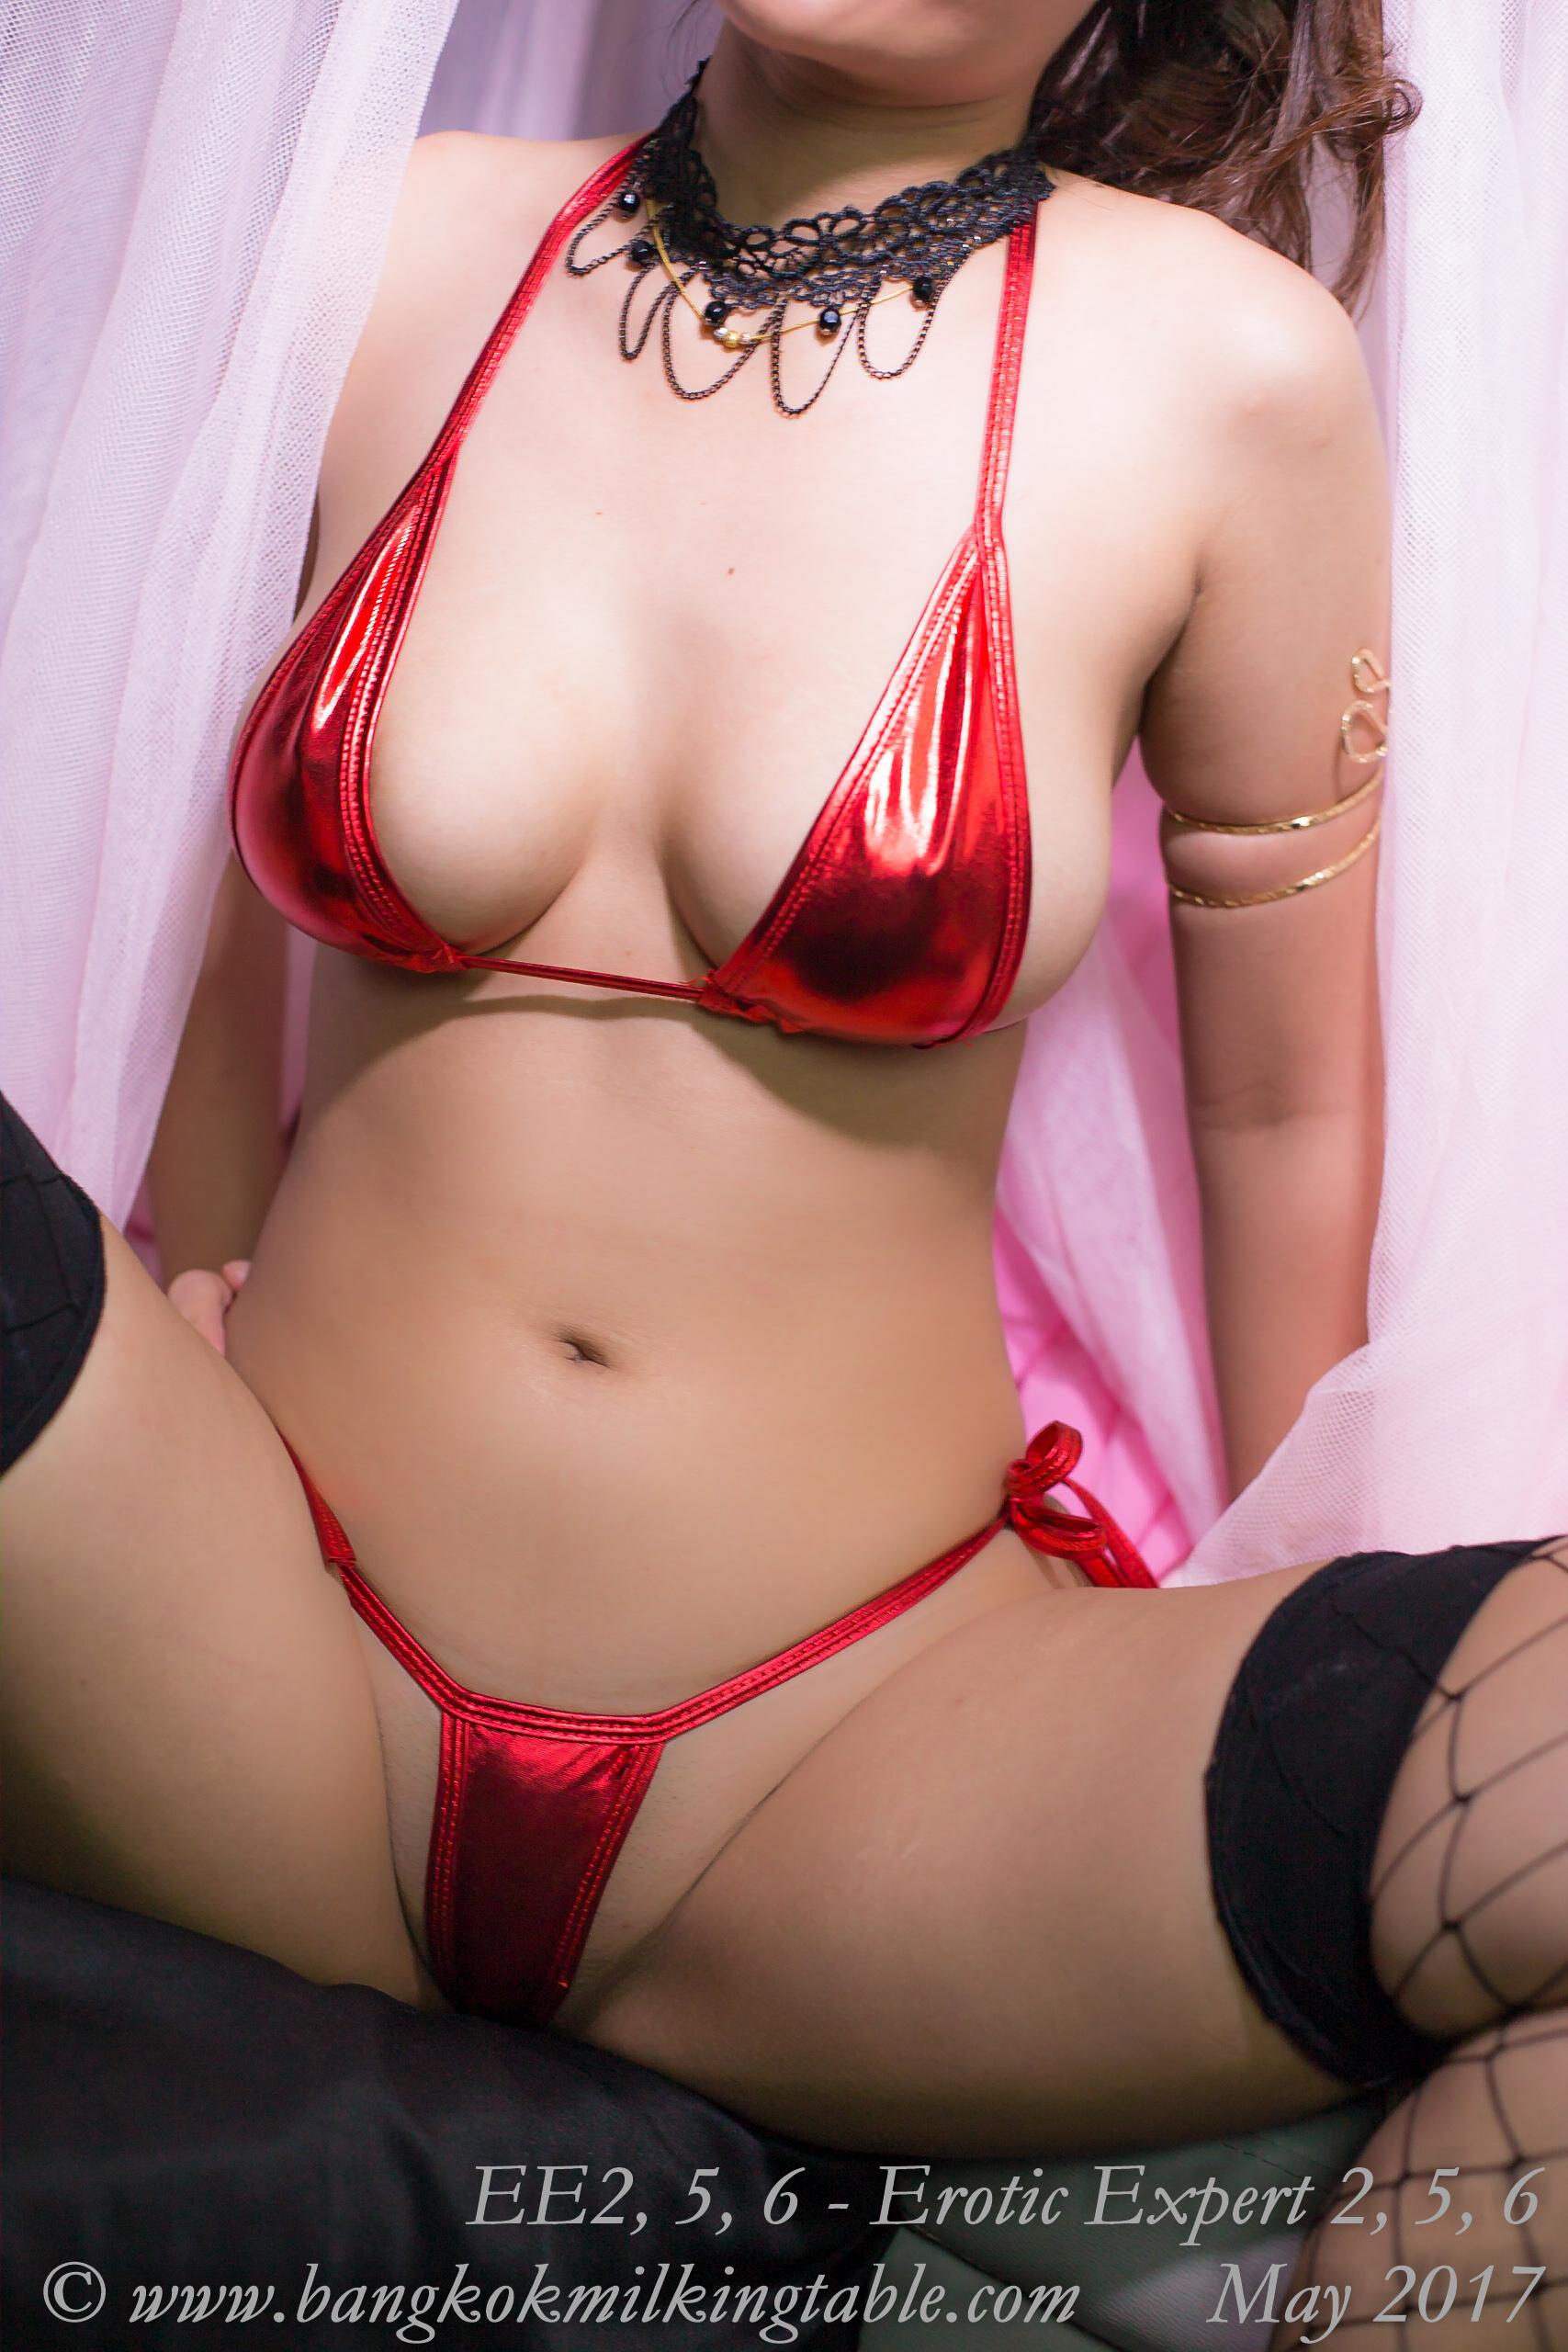 Erotic Expert 2, 5, 6 - string bikini - Bangkok Escort Massage Milking 0517-64